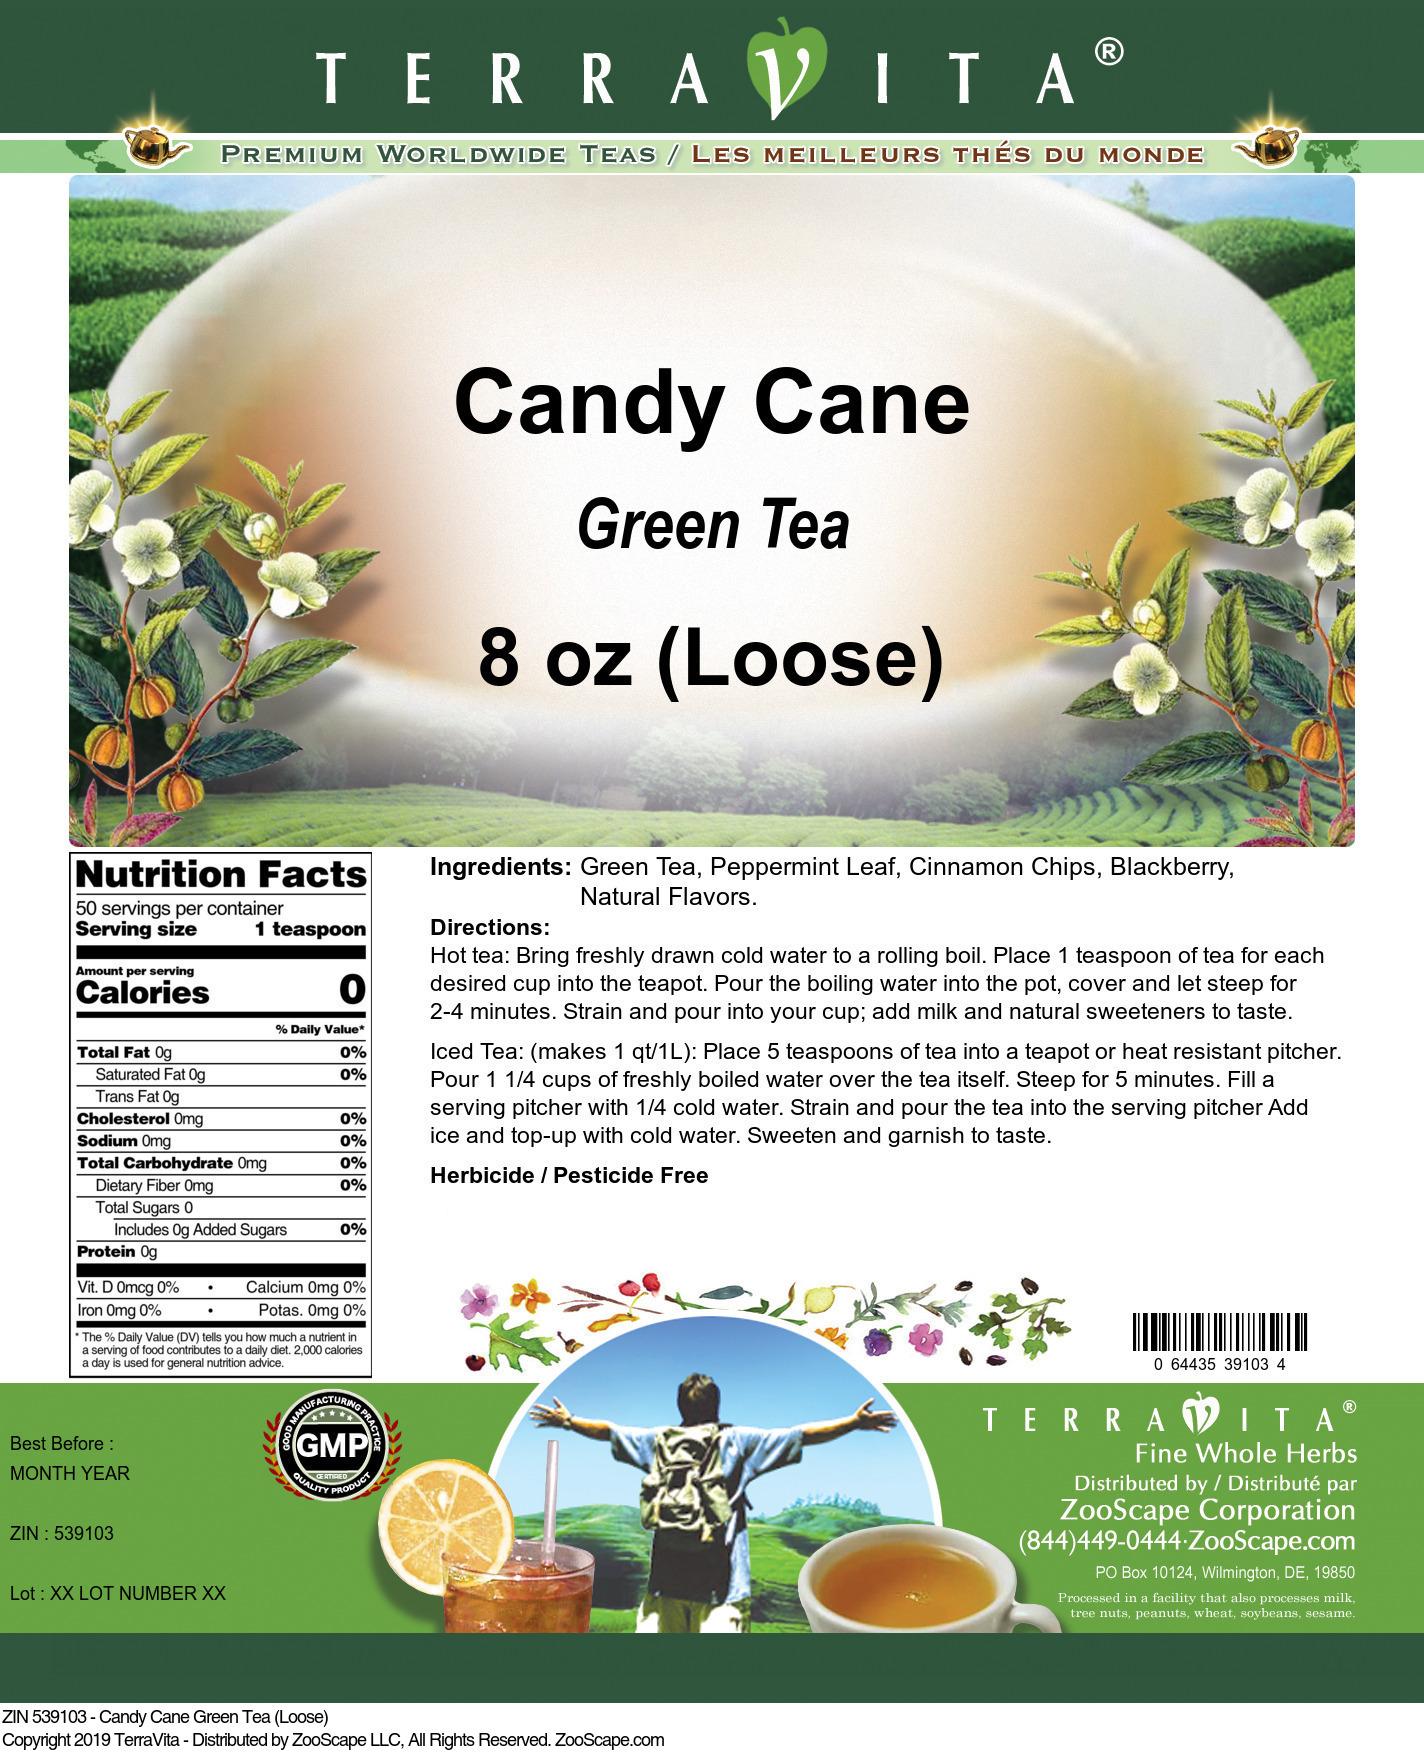 Candy Cane Green Tea